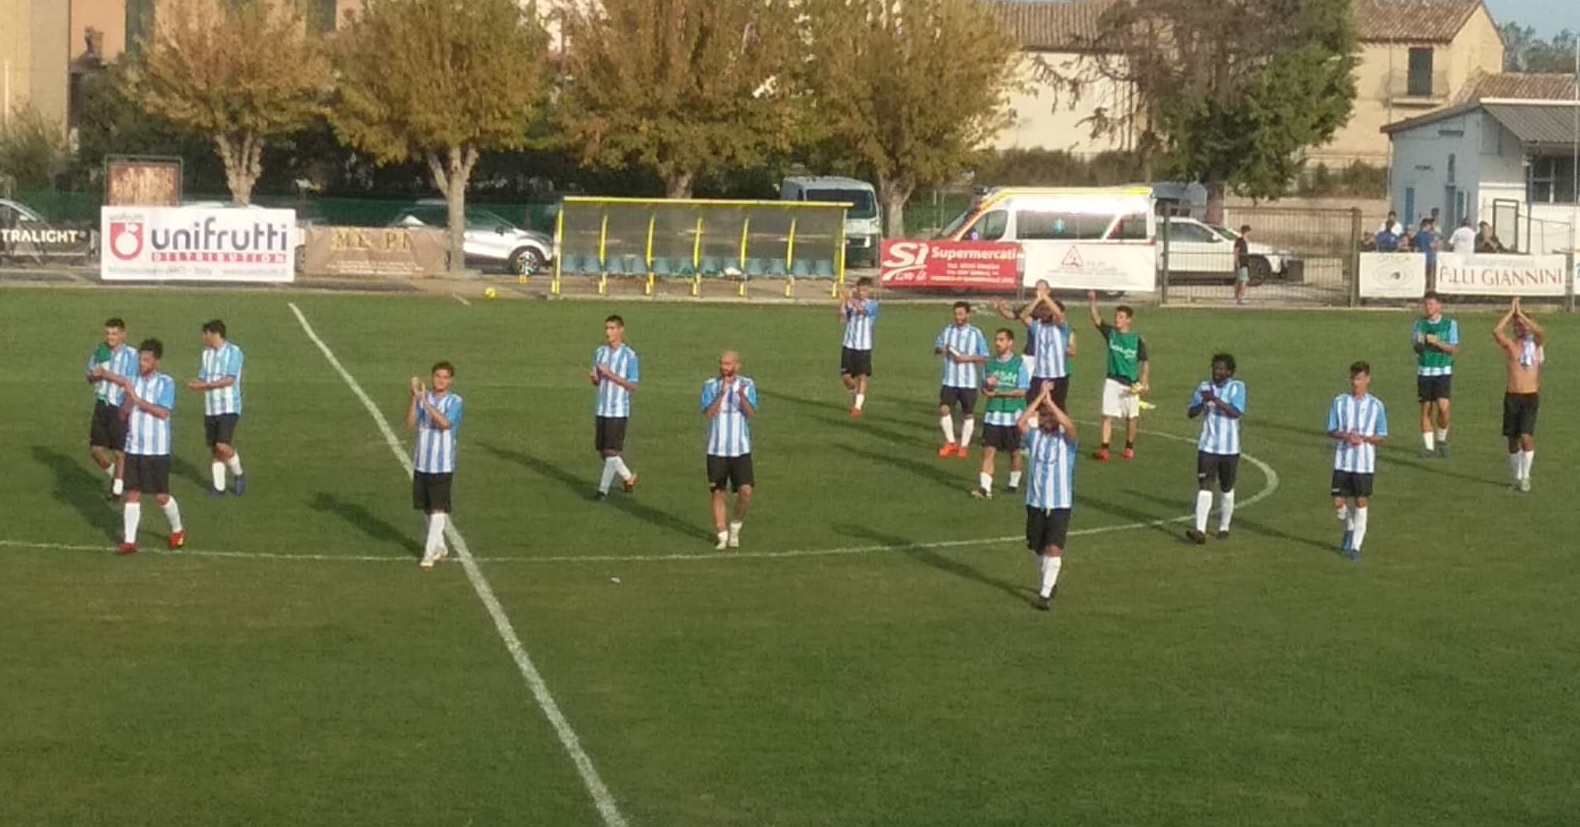 Trodica-Mancini Ruggero Pioraco 4-0, tripletta di Ulissi